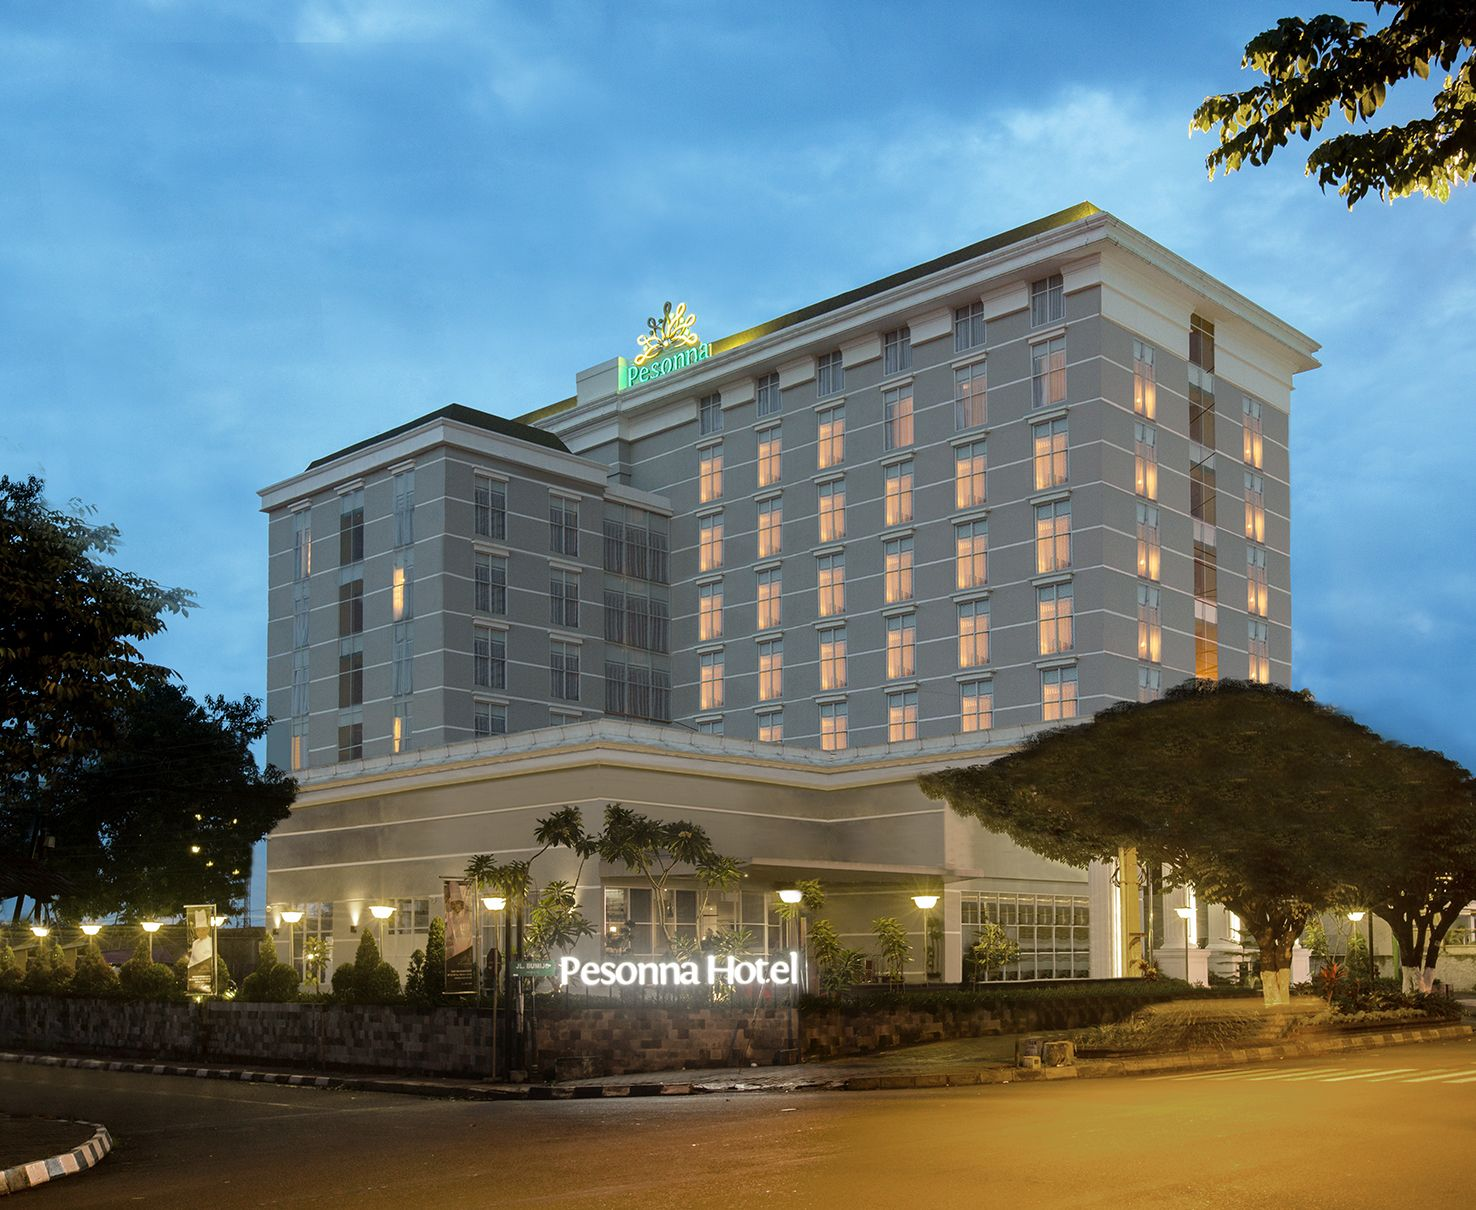 Pesonna Hotel Tugu Yogyakarta, Yogyakarta